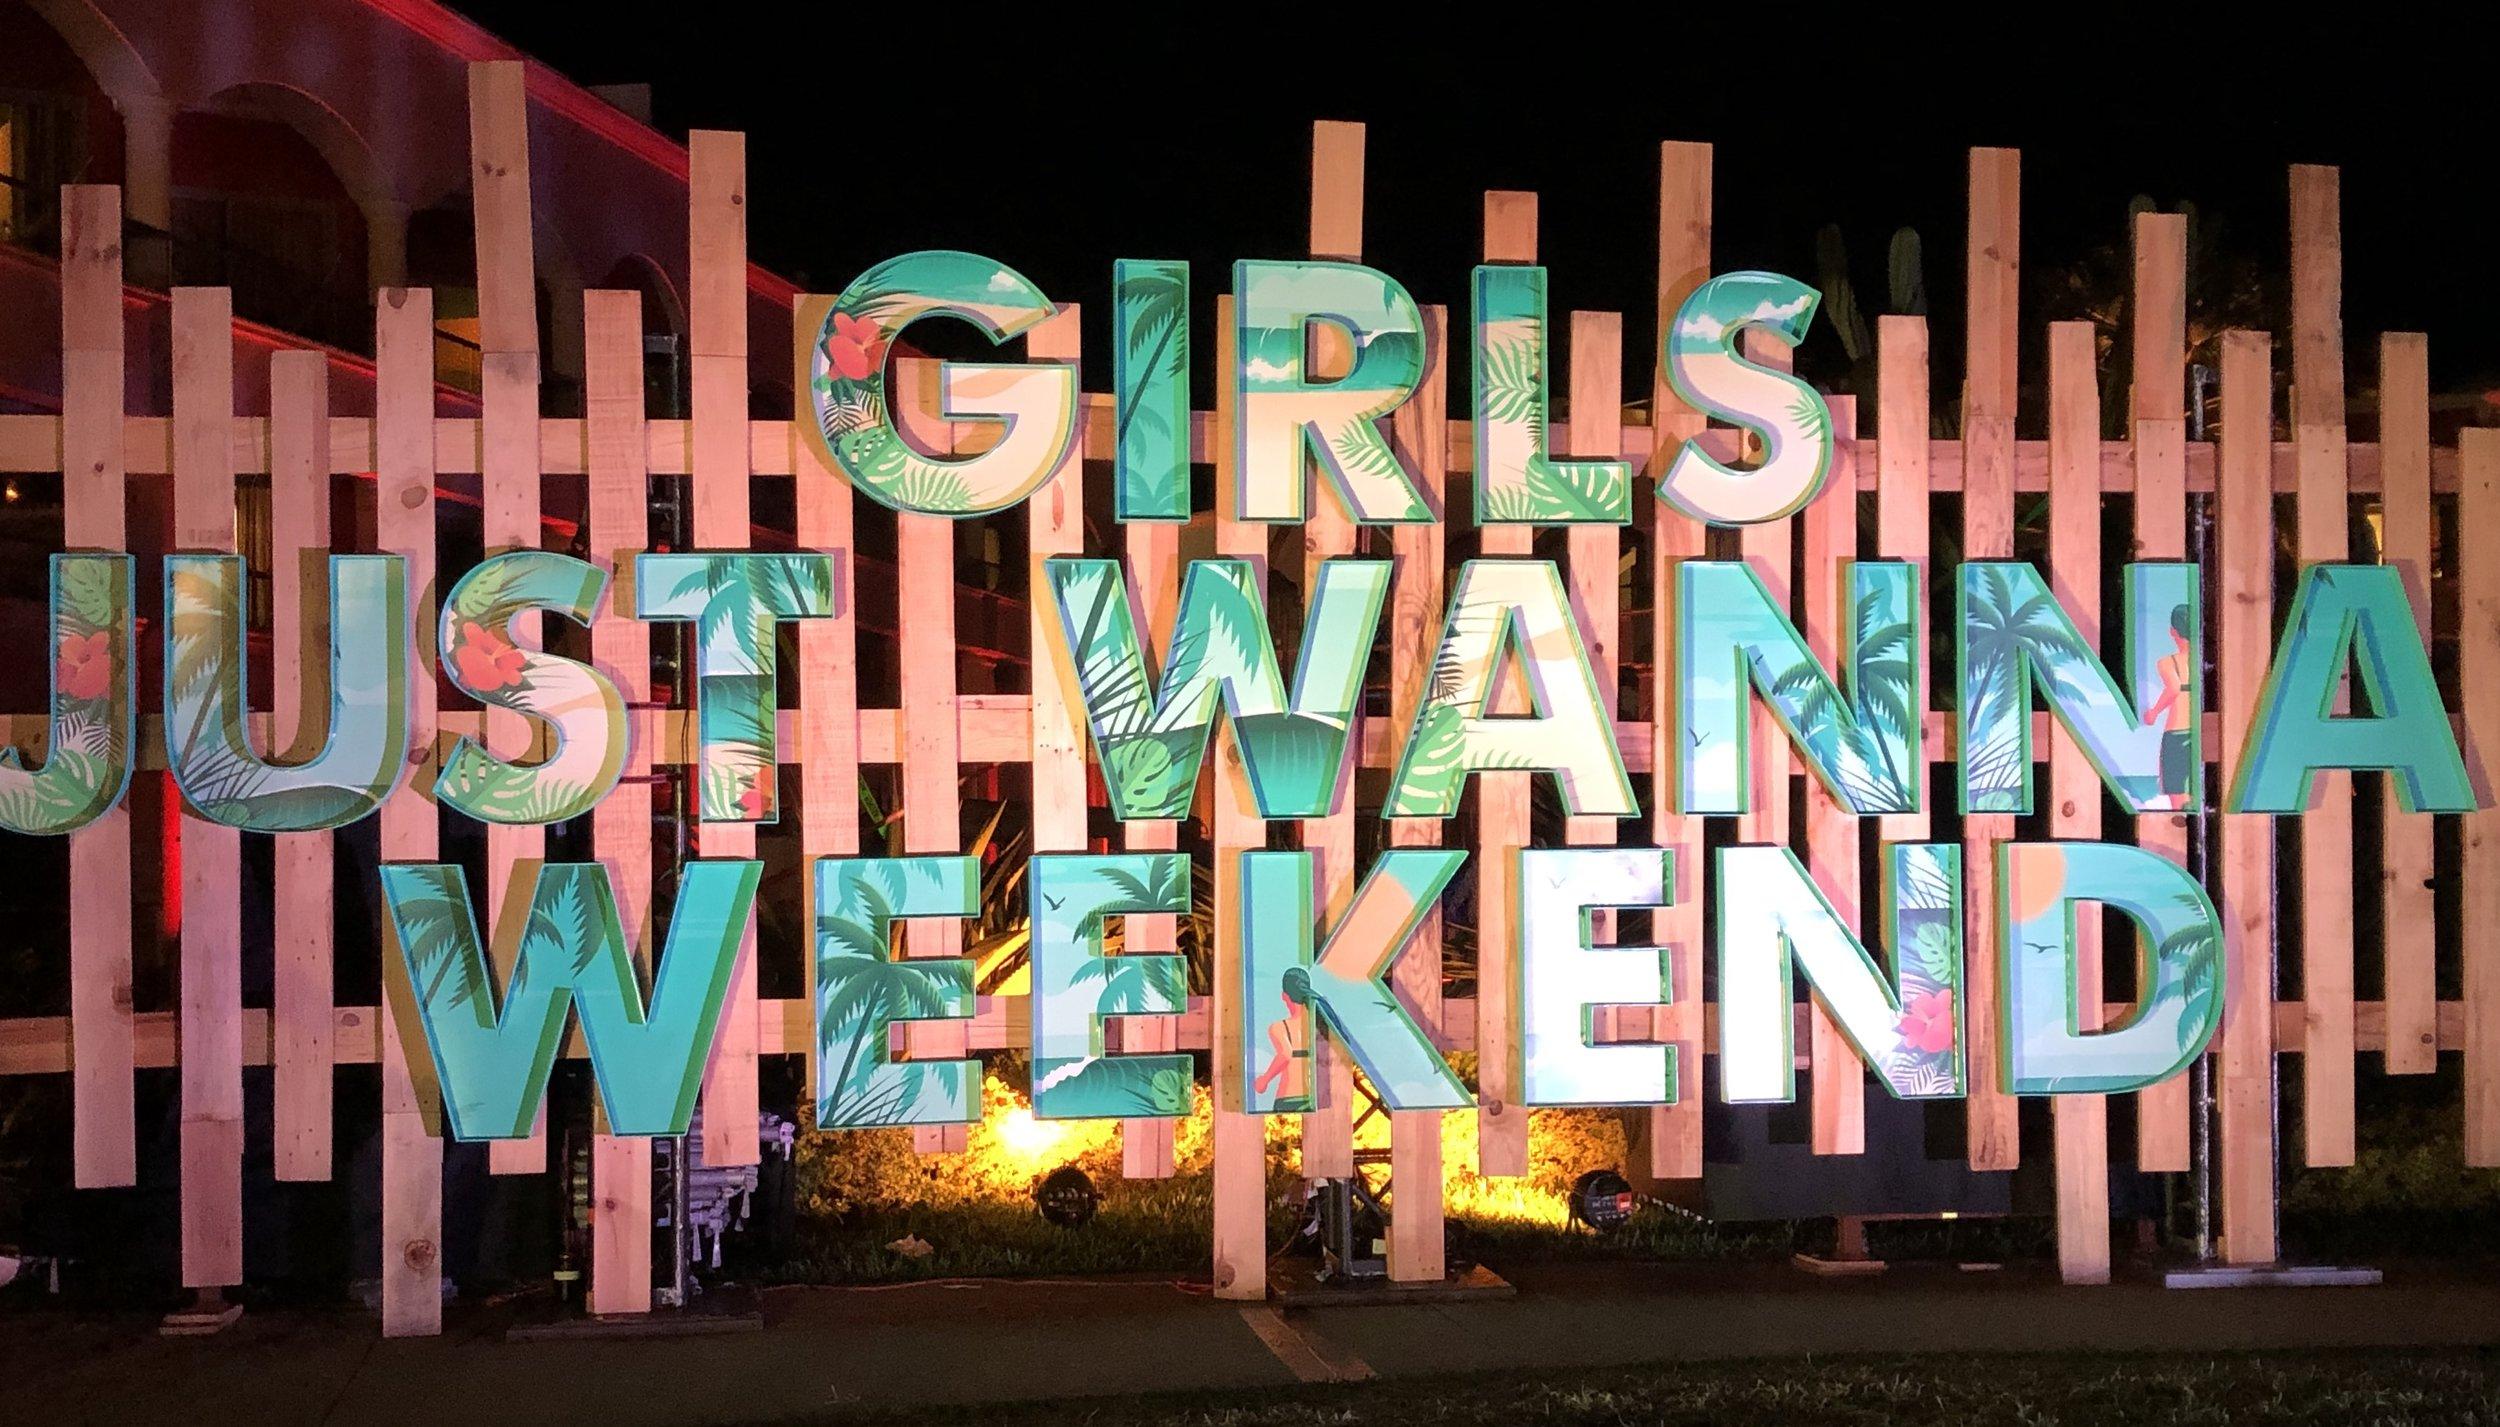 Brandi Carlile Girls Just Wanna Weekend sign